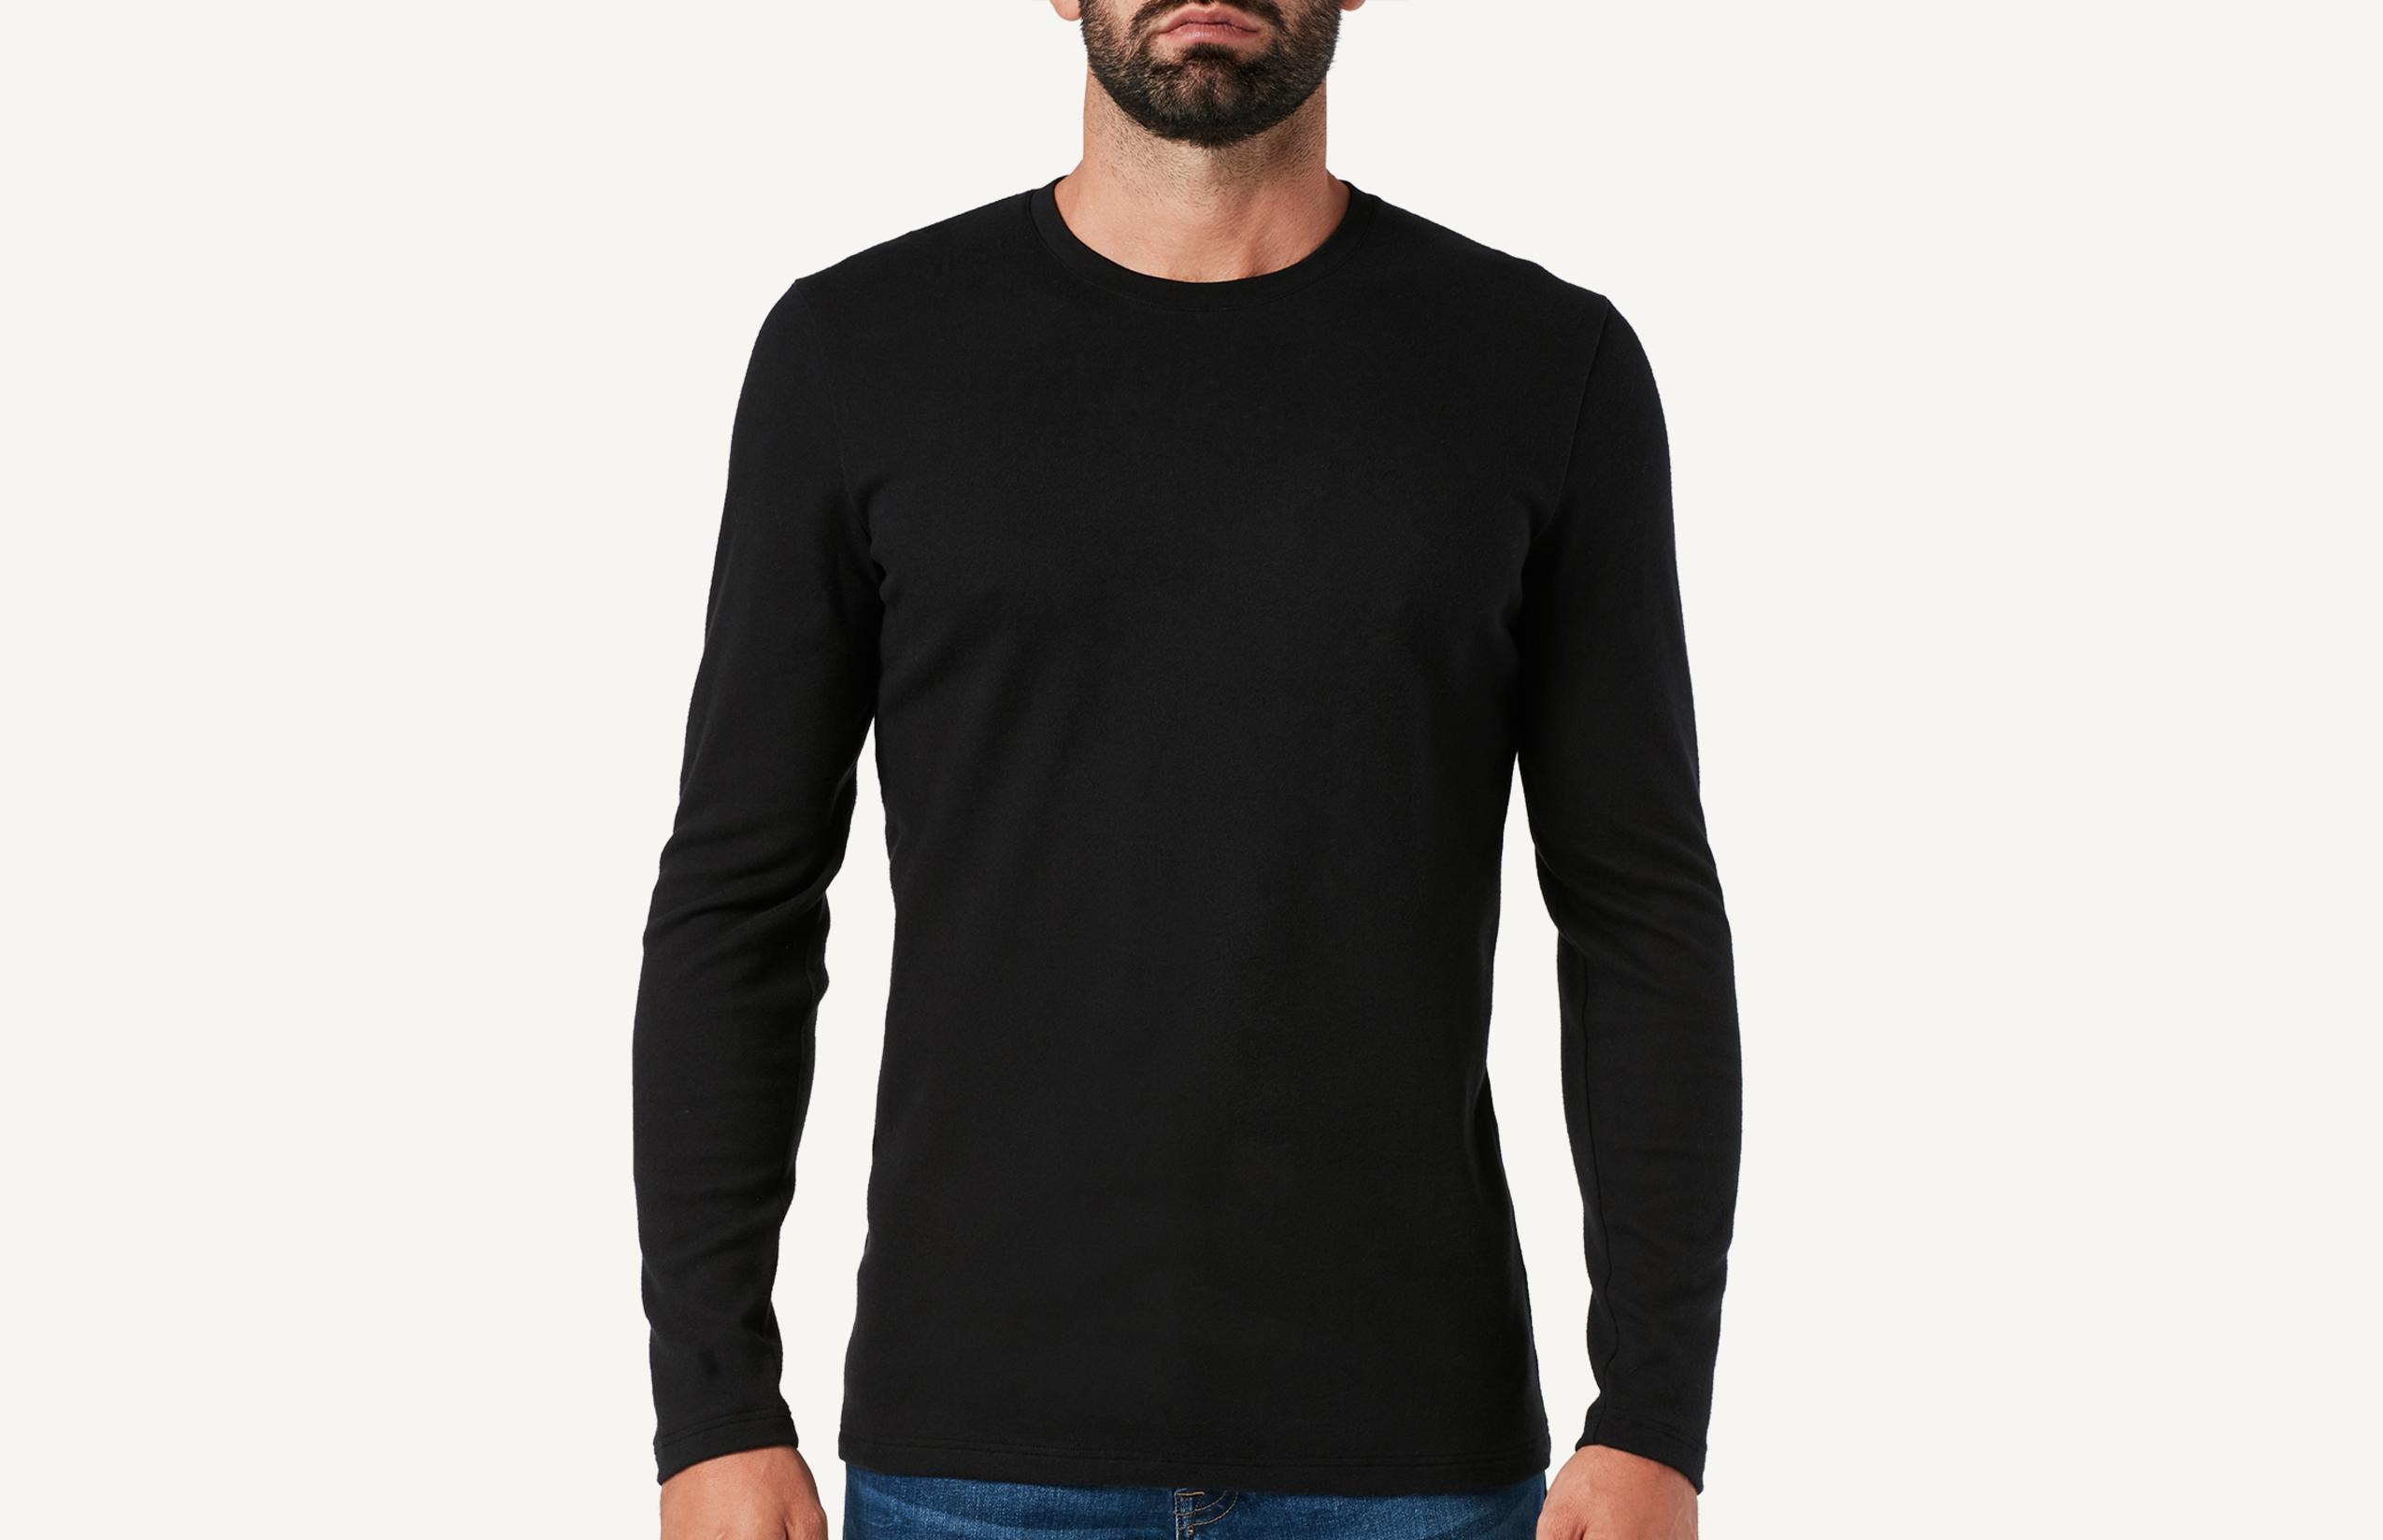 Intimissimi Langarm-Shirt Aus Warmer Baumwolle